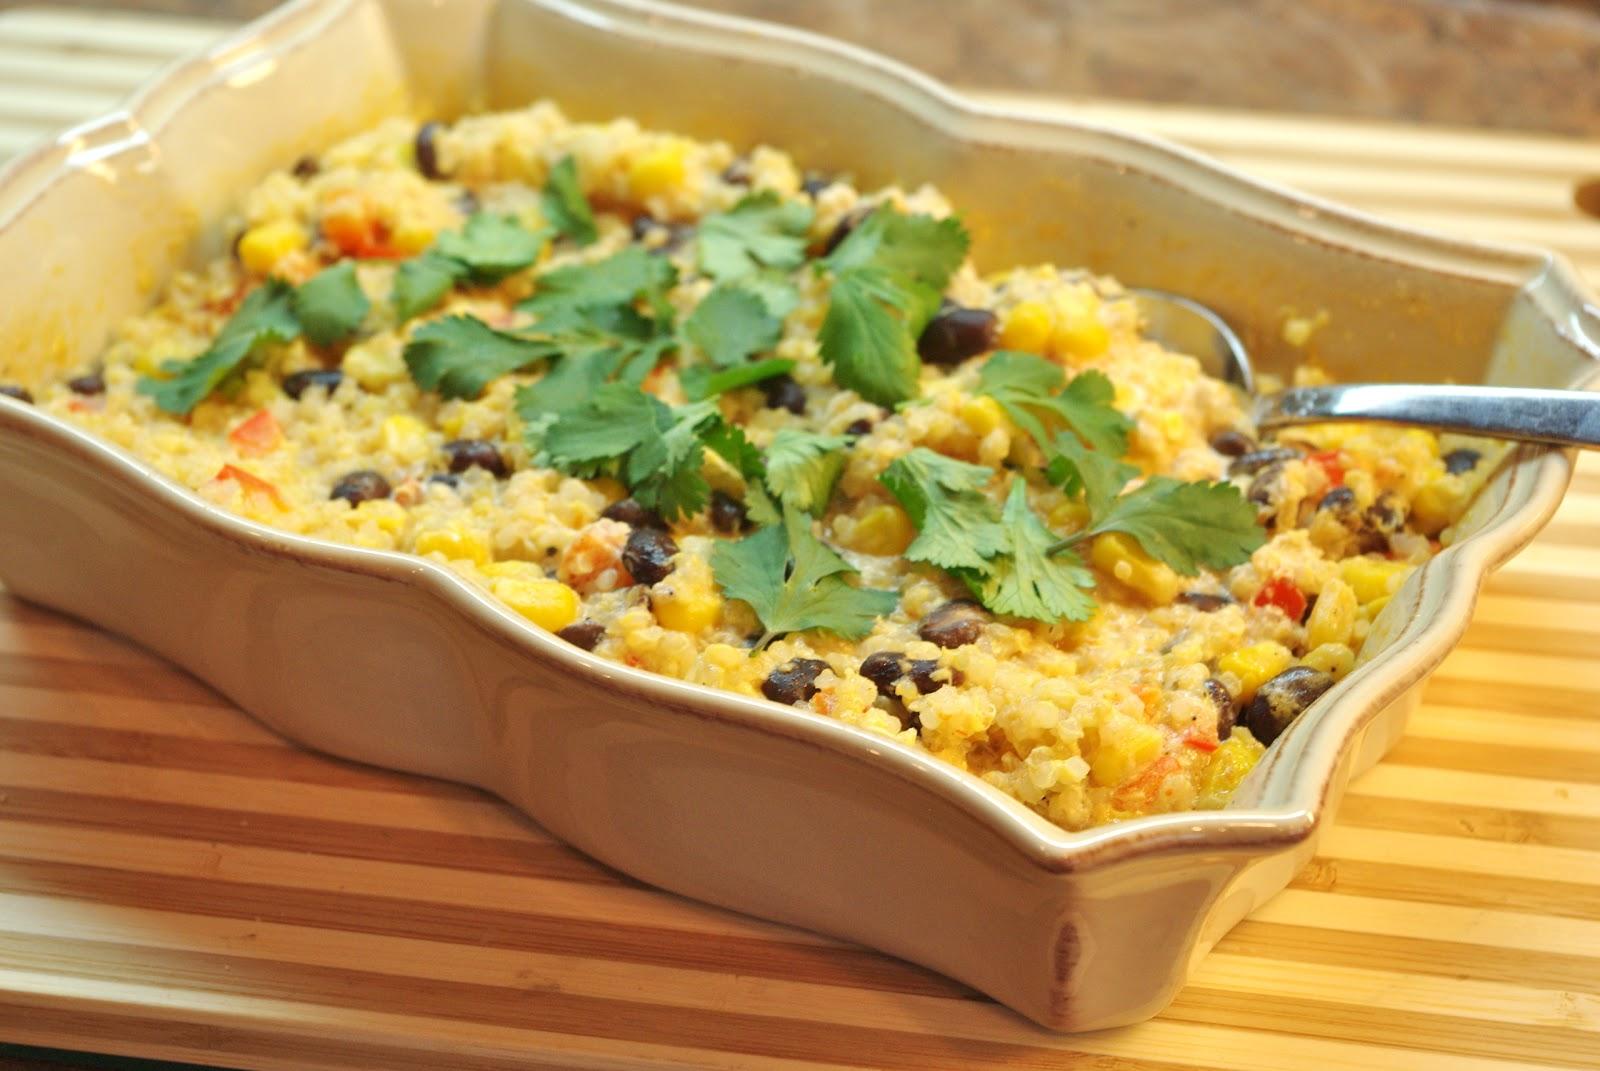 Mennonite Girls Can Cook: Quinoa Side Dish